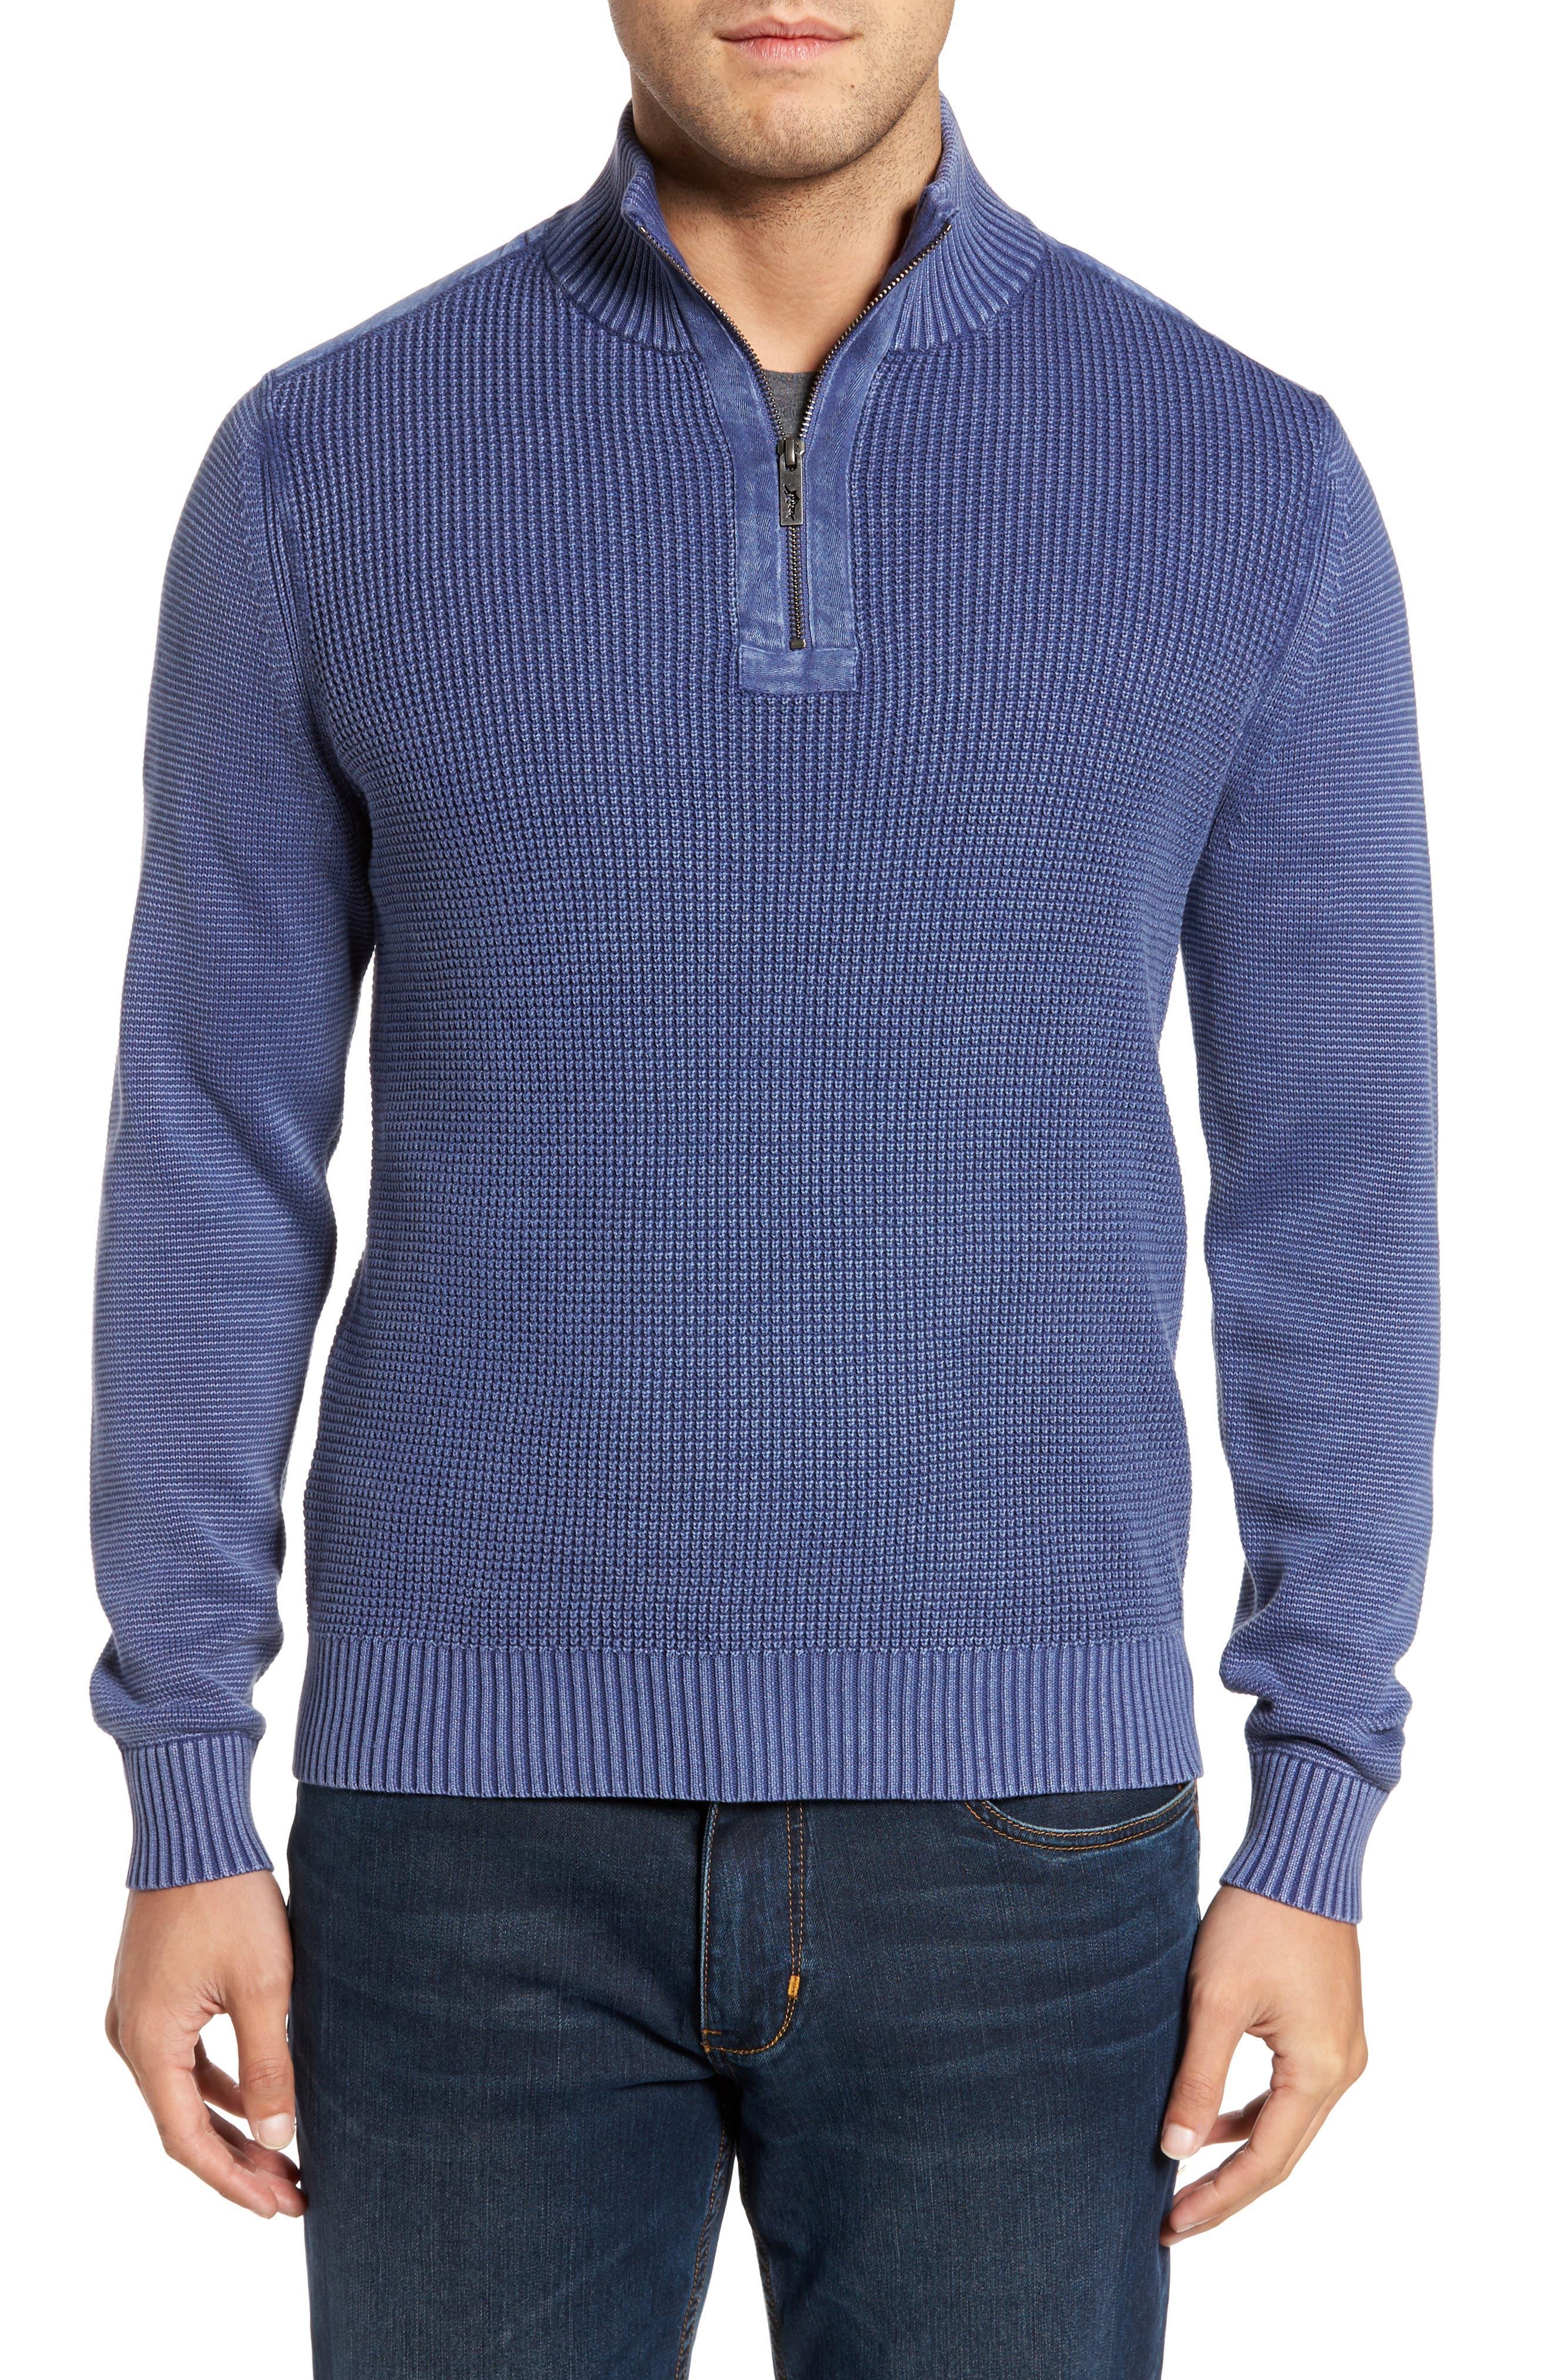 Coastal Shores Quarter Zip Sweater,                             Main thumbnail 3, color,